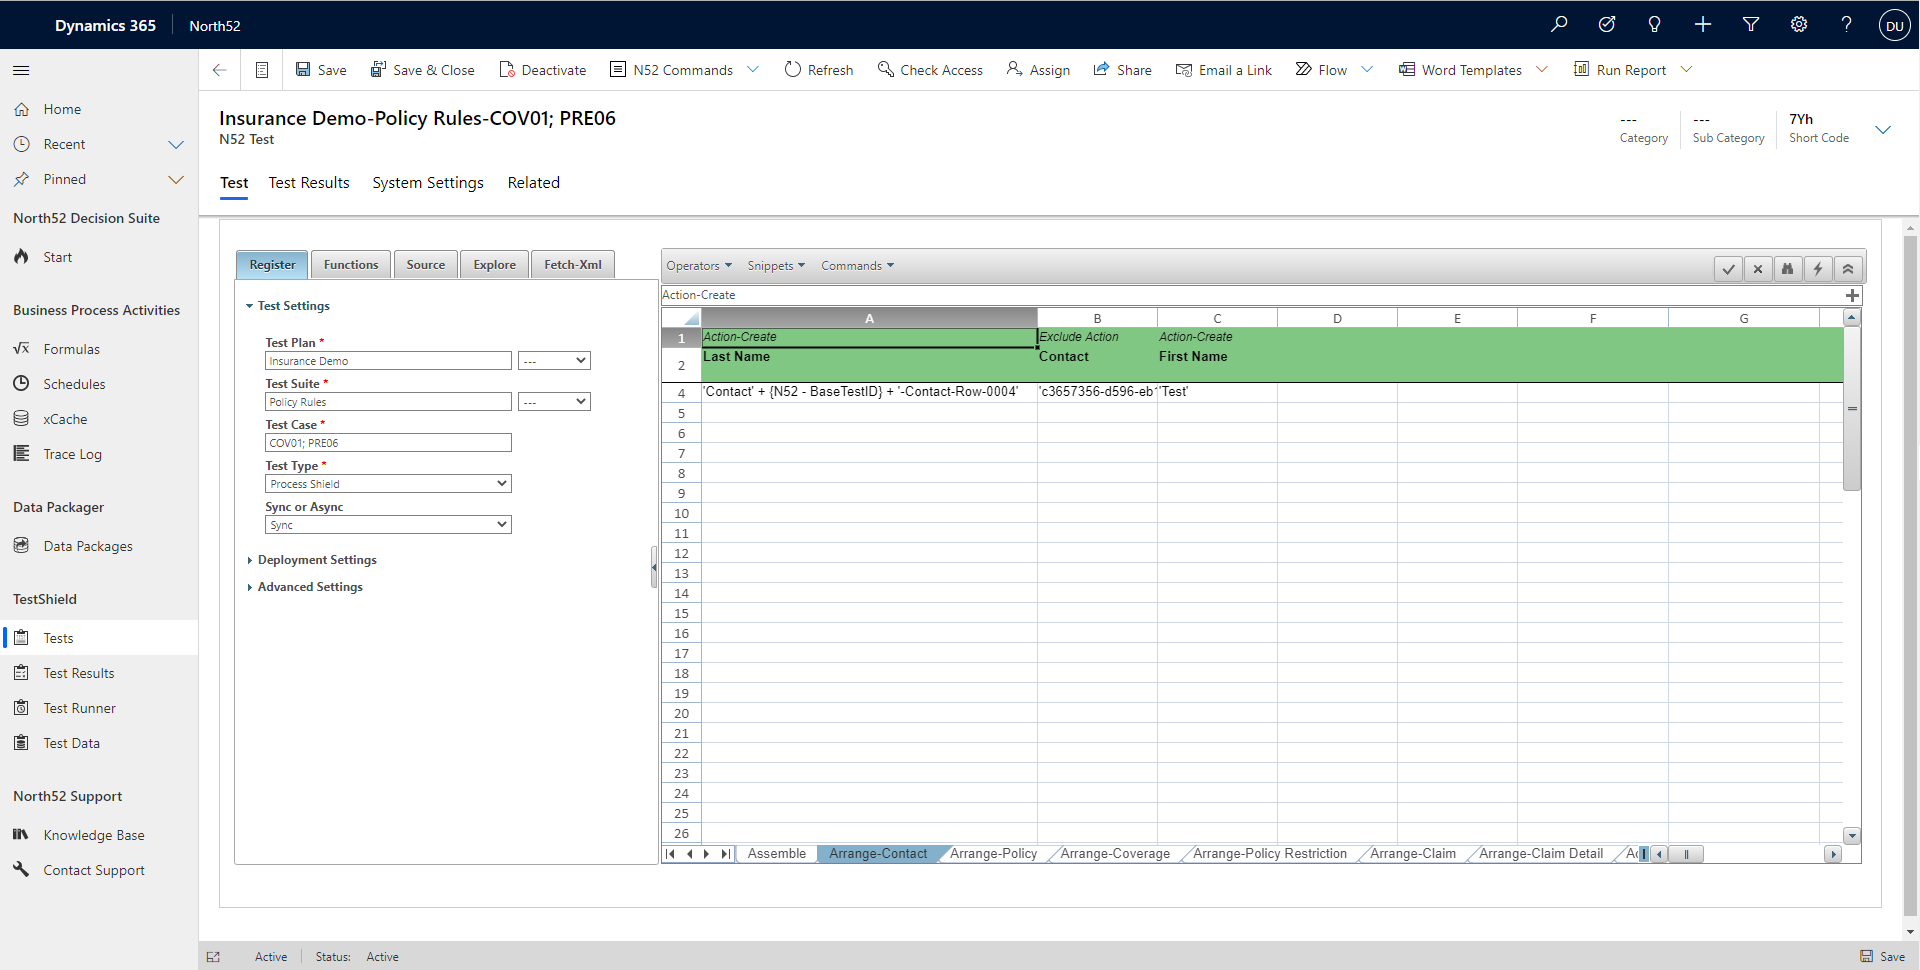 Insurance Claims Adjudication Automated Testing - Microsoft Dynamics 365